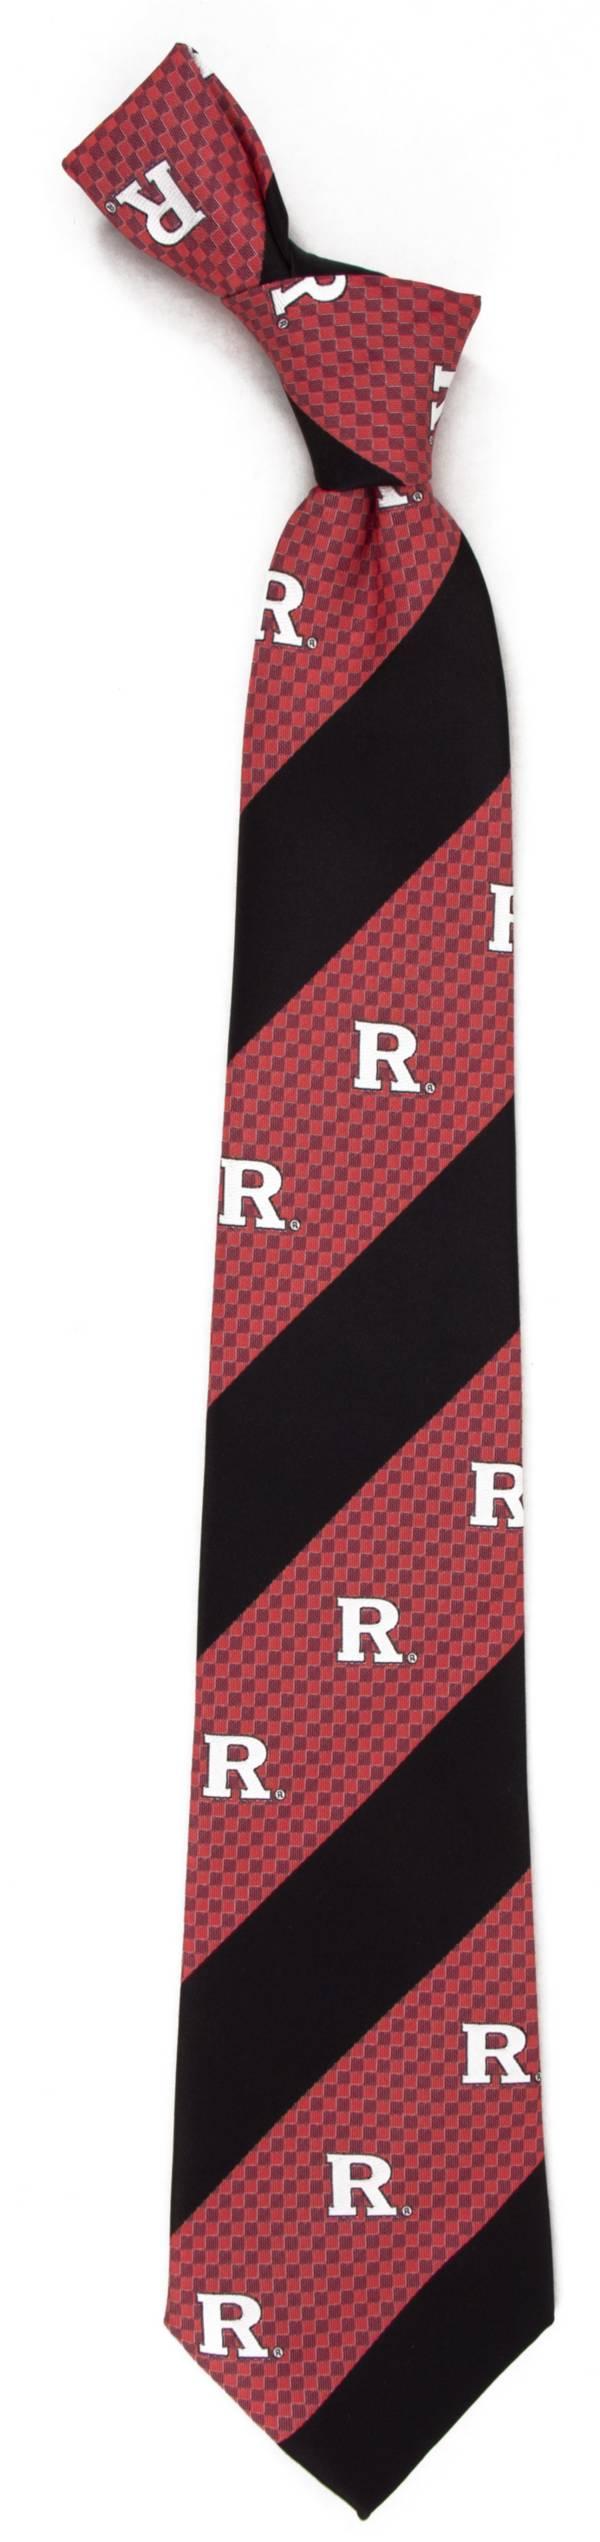 Eagles Wings Rutgers Scarlet Knights Geo Stripe Necktie product image